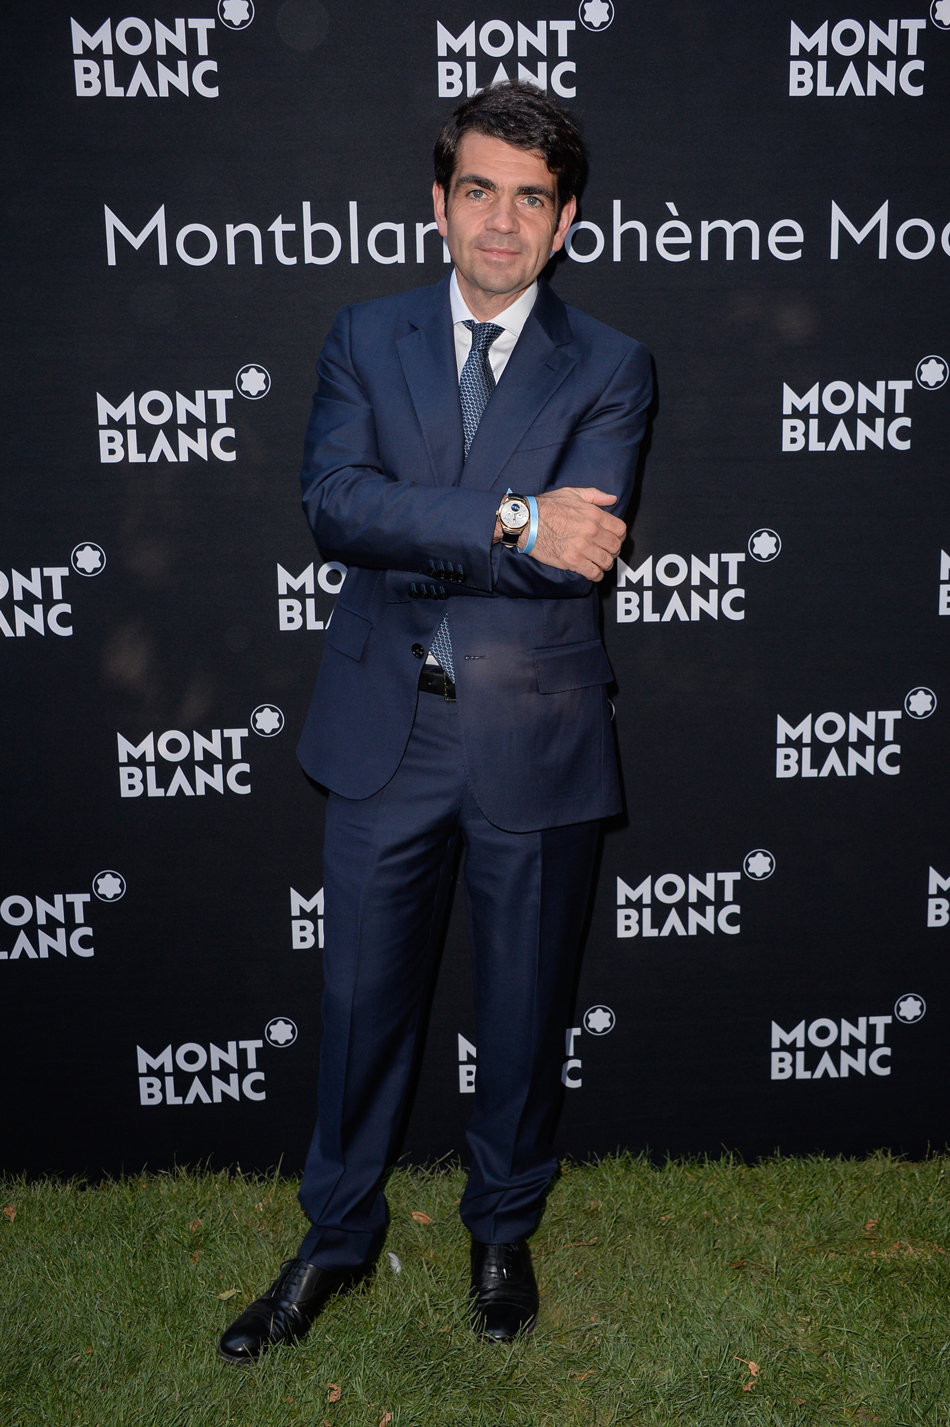 1Montblanc-CEO-Jerome-Lambert-attends-Montblanc-Boheme.jpg